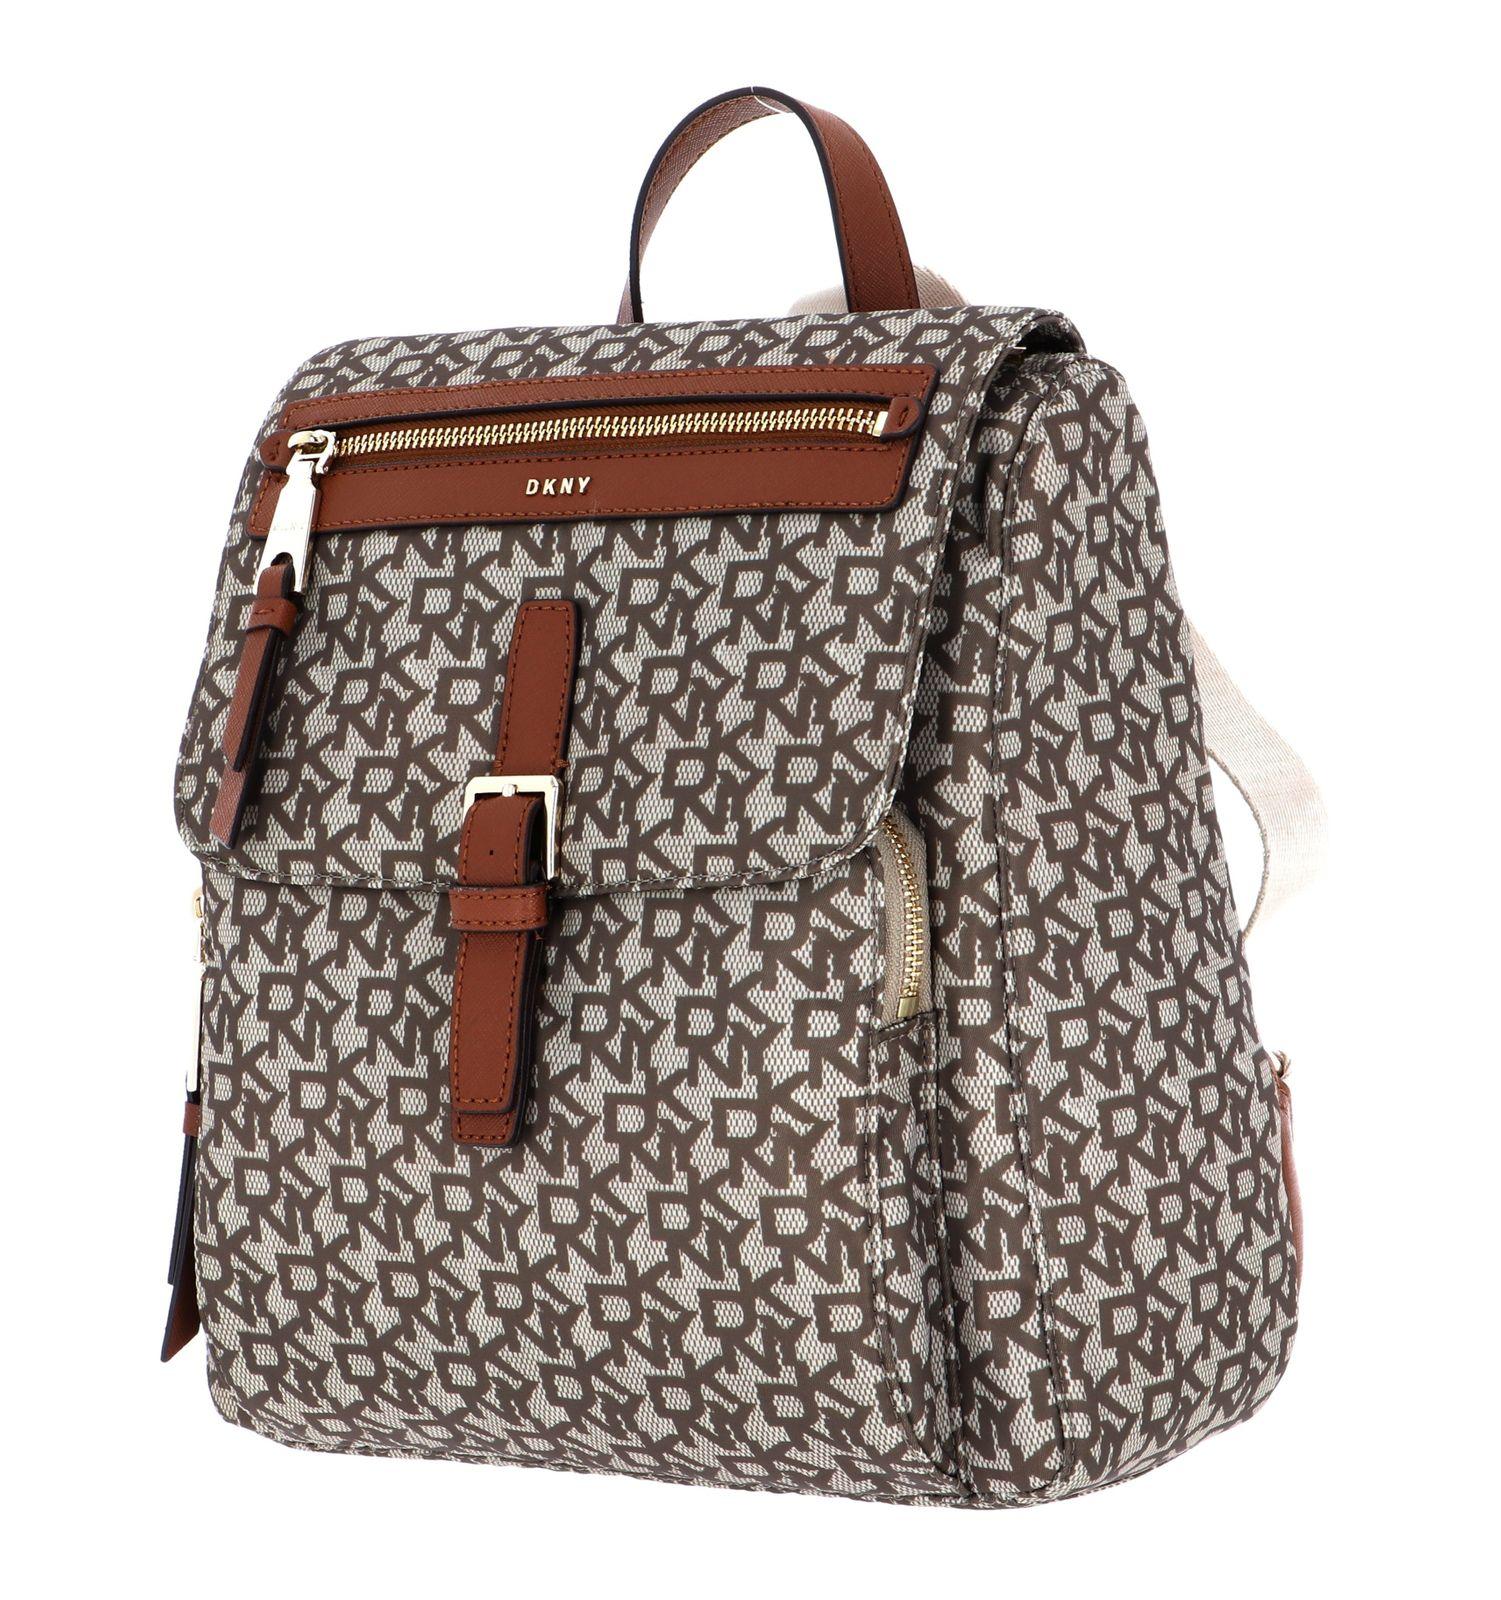 DKNY Cora Backpack Chino / Caramel